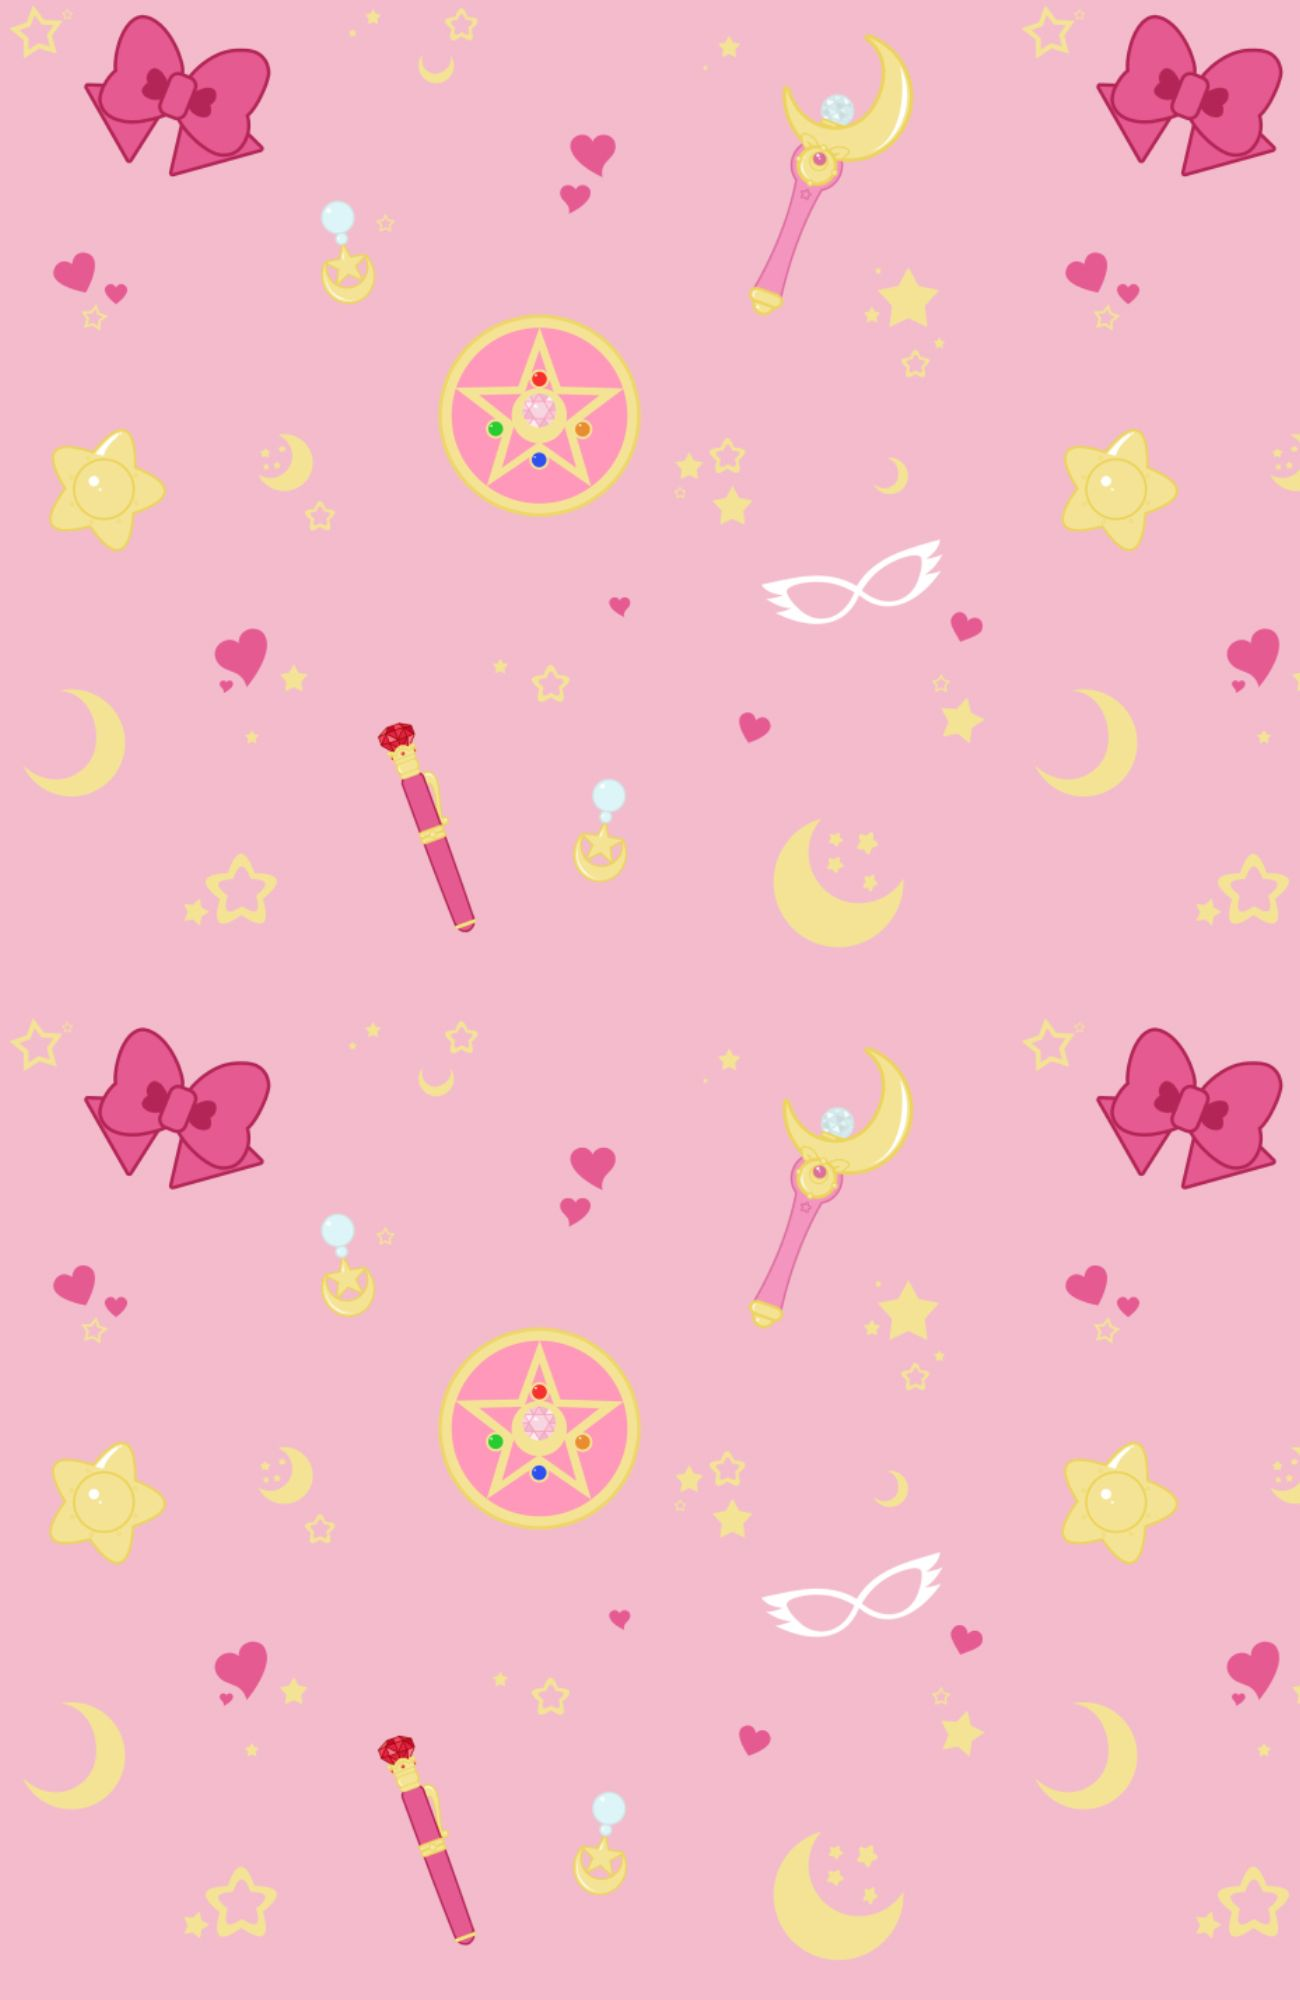 Sailor Moon Child カワイイ壁紙, 携帯電話の背景, セーラームーンクリスタル, ムーンアート